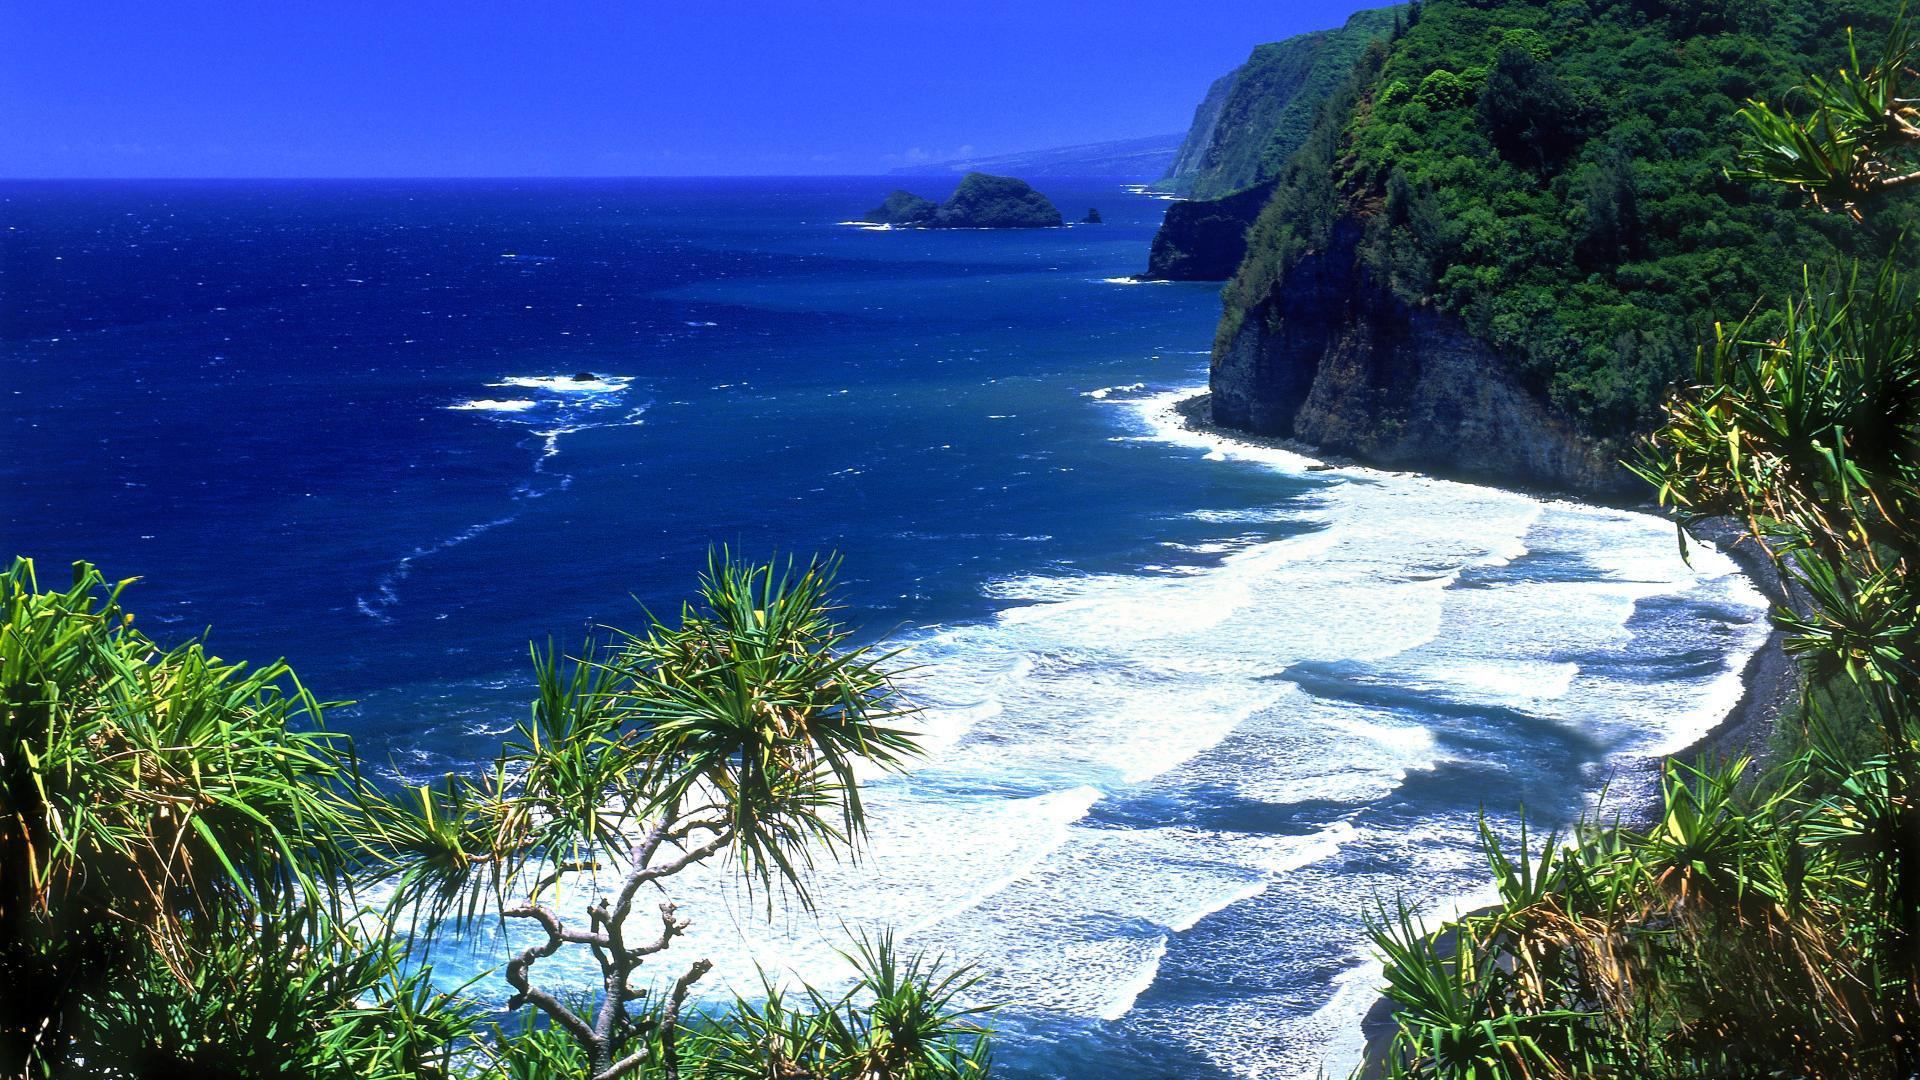 Hawaii HD Wallpaper 1920x1080 60  images